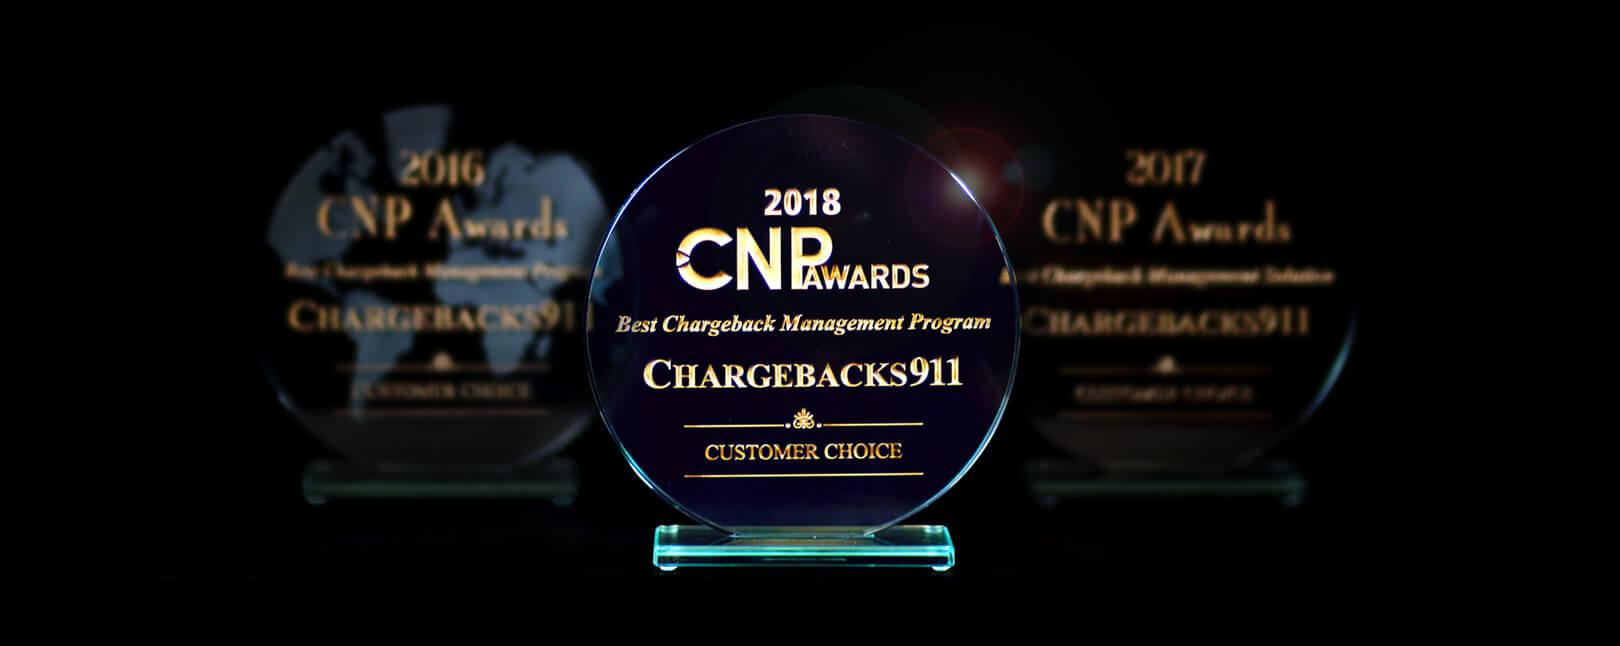 Best Chargeback Management Solution 2018